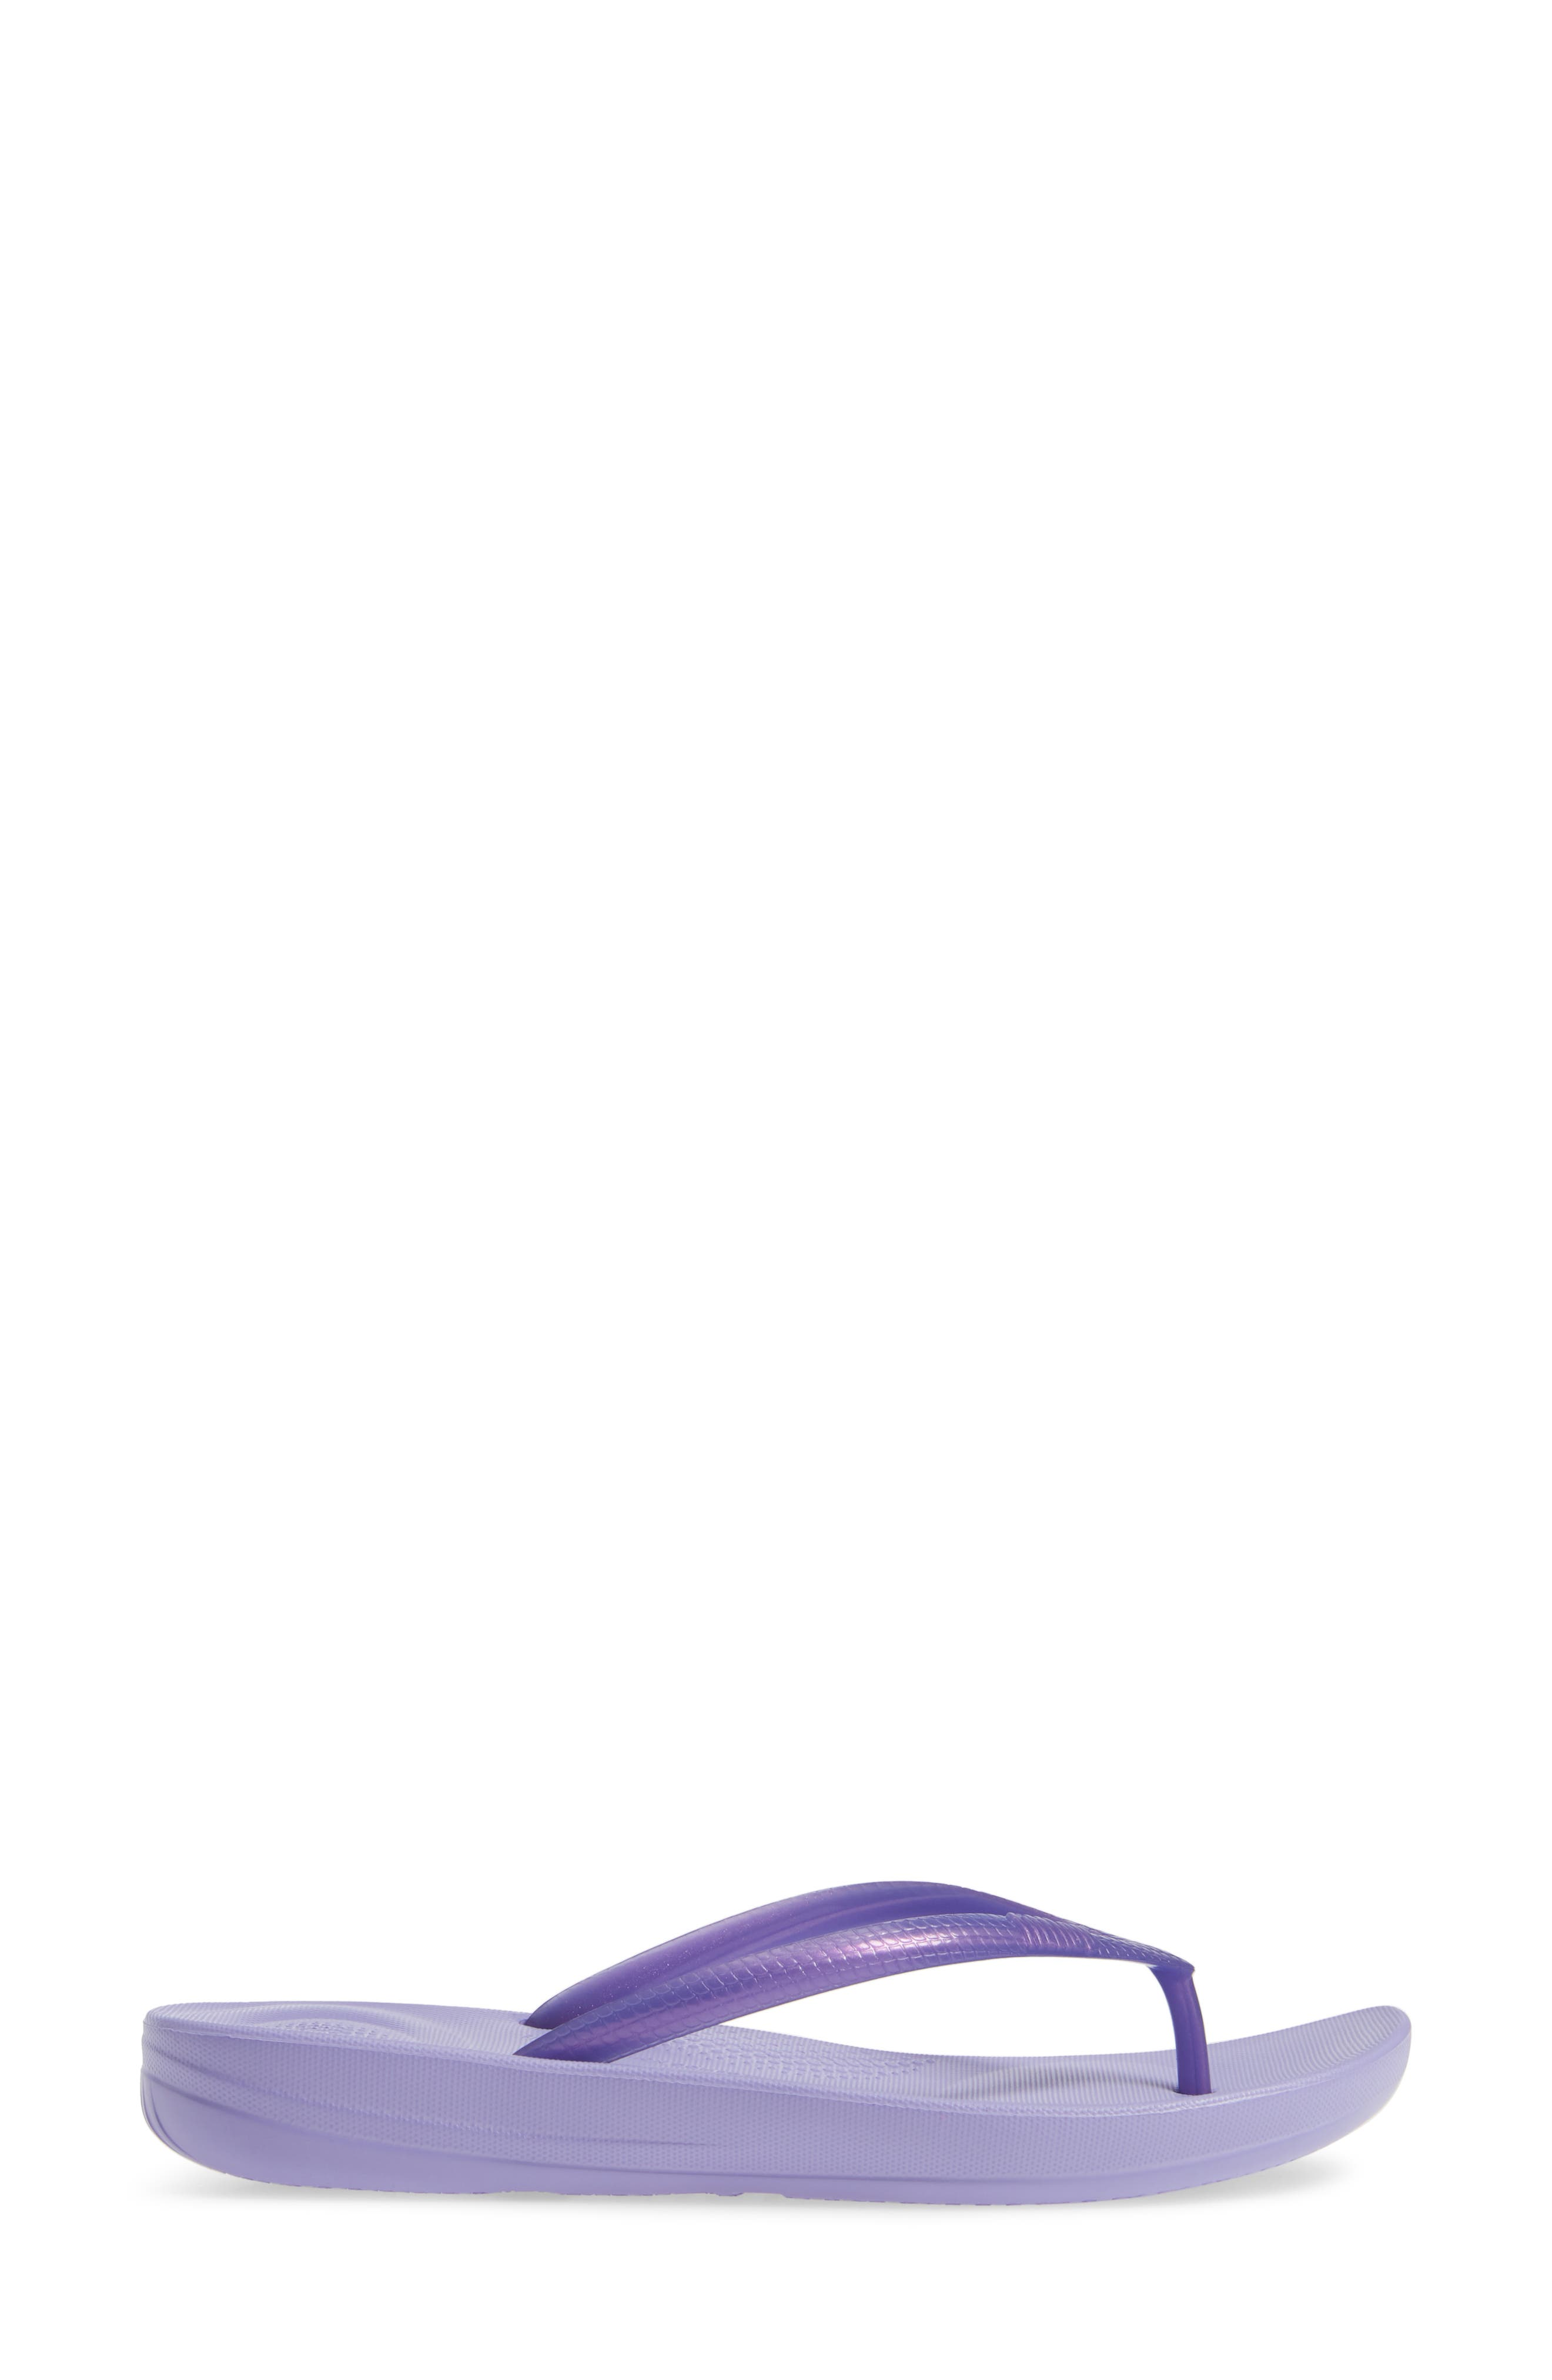 iQUSHION<sup>™</sup> Ergonomic Flip Flop,                             Alternate thumbnail 3, color,                             FROSTED LAVENDER